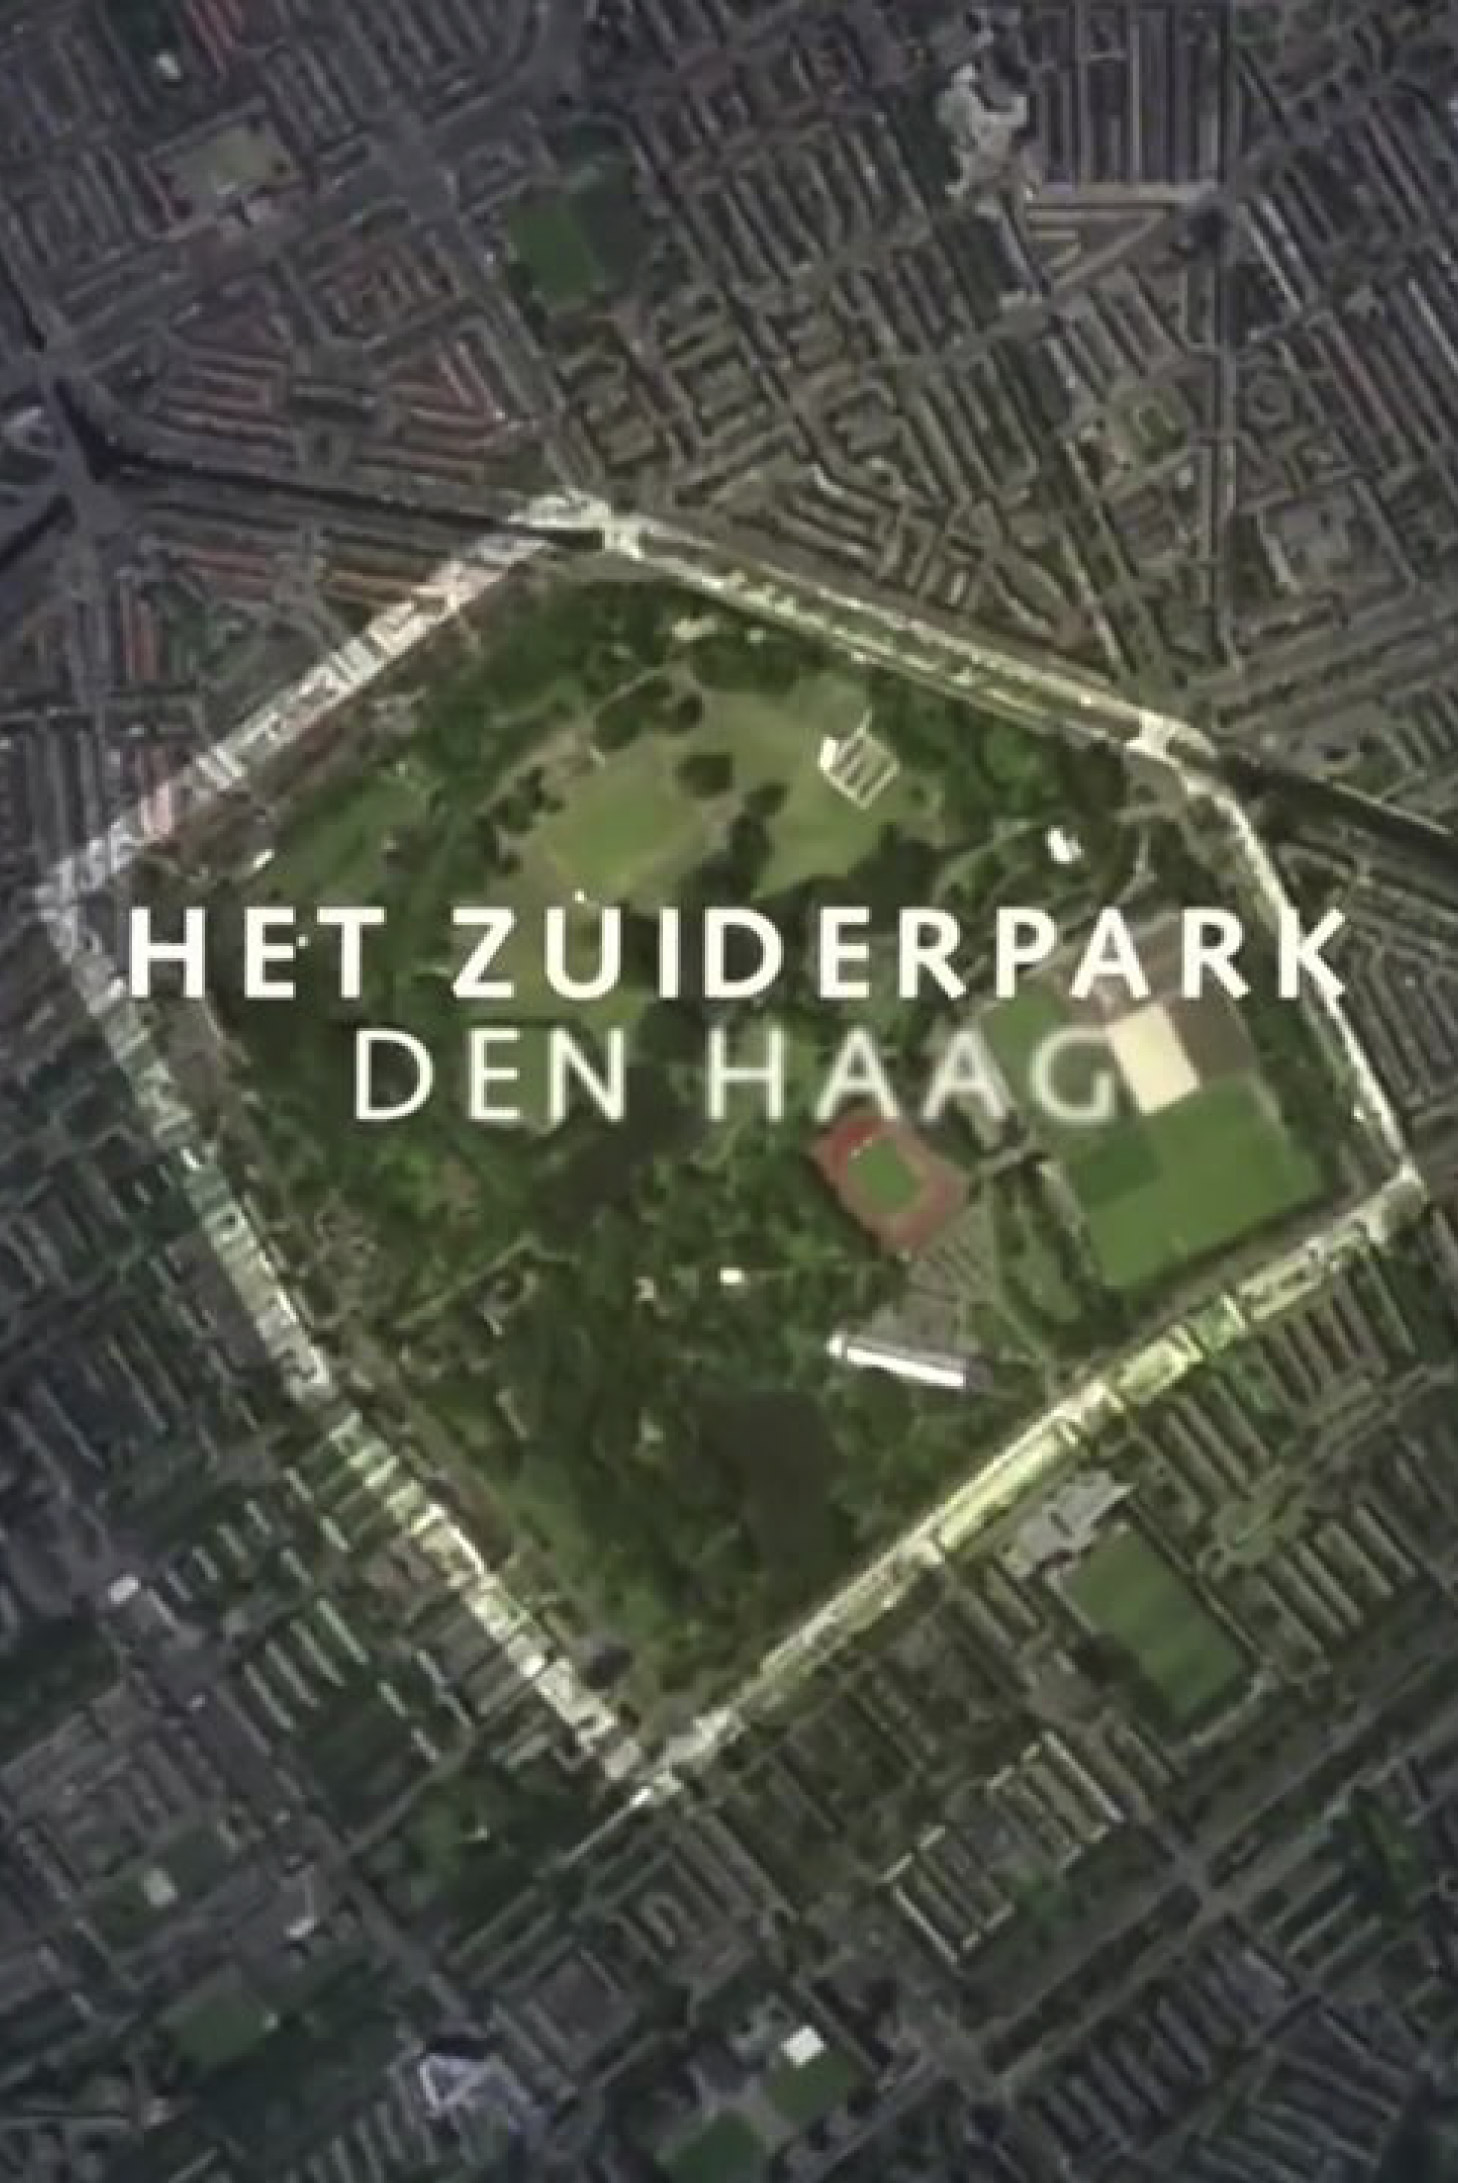 ZuiderparkDenHaag-01